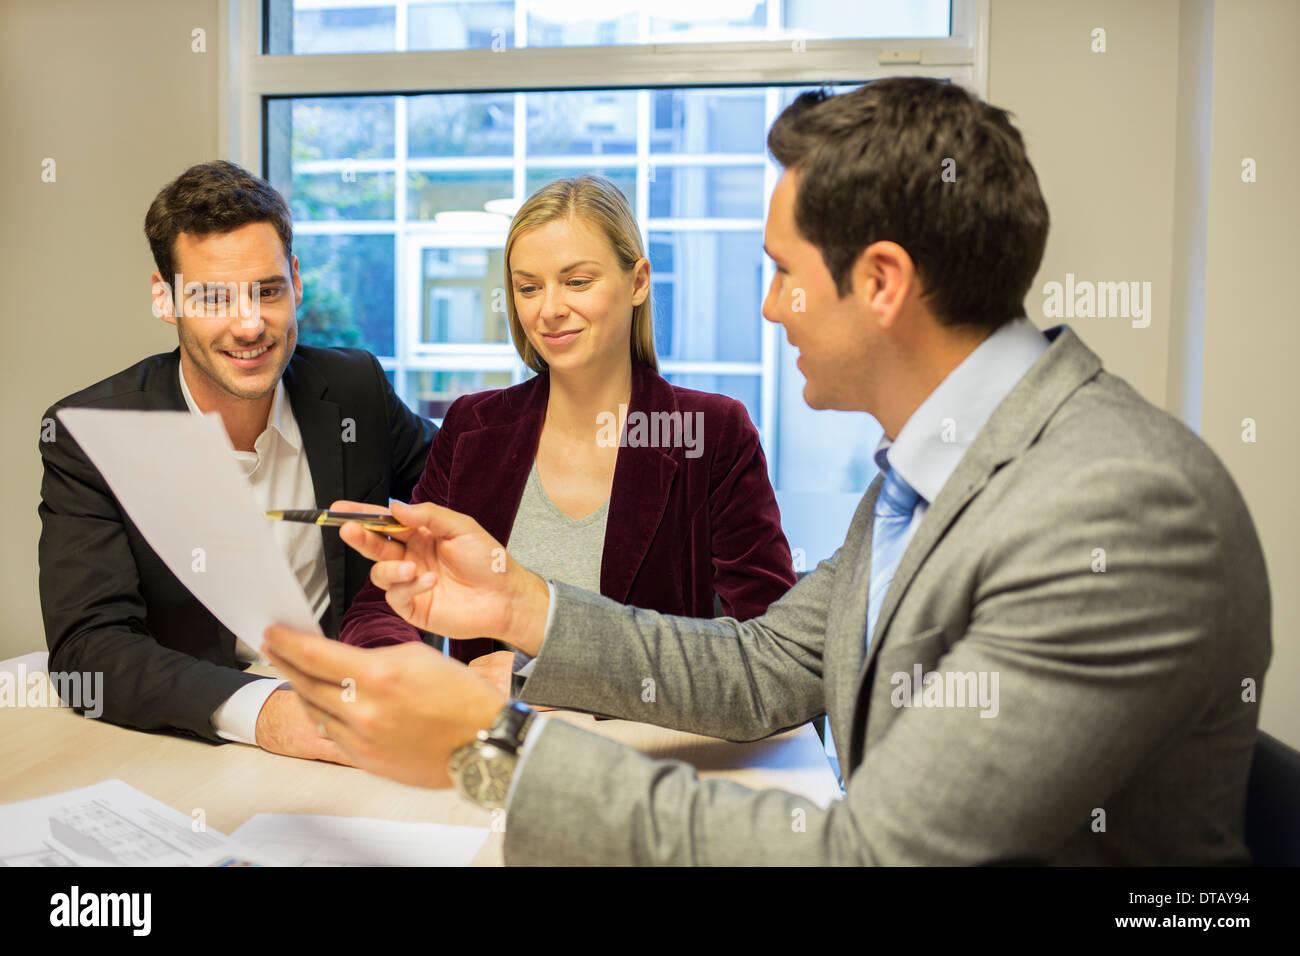 Jeune couple signing contract in office withe immobilier, de nouveaux propriétaires Photo Stock